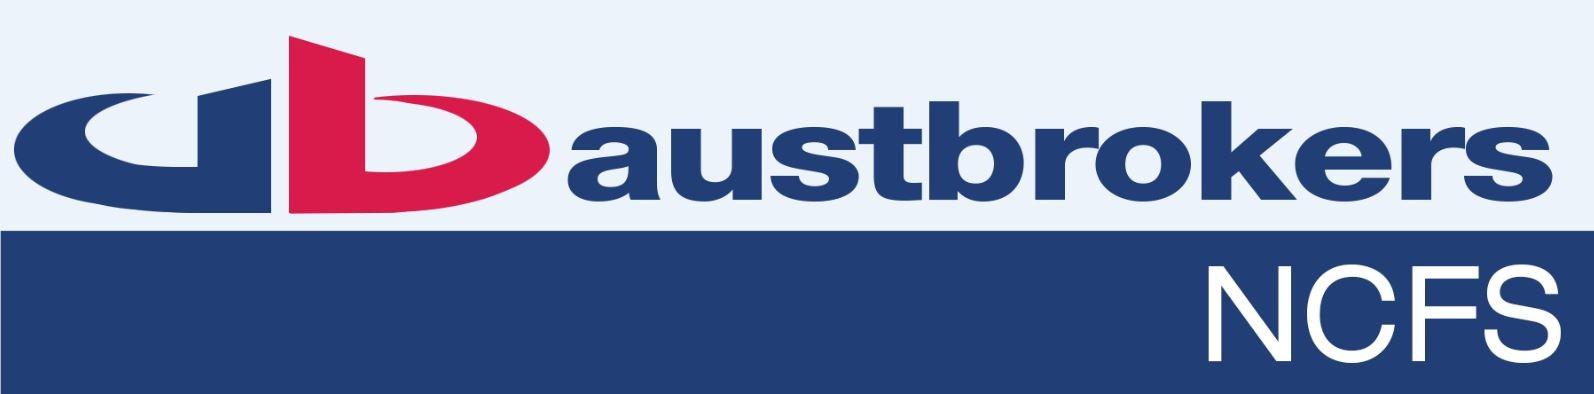 Austbrokers NCFS